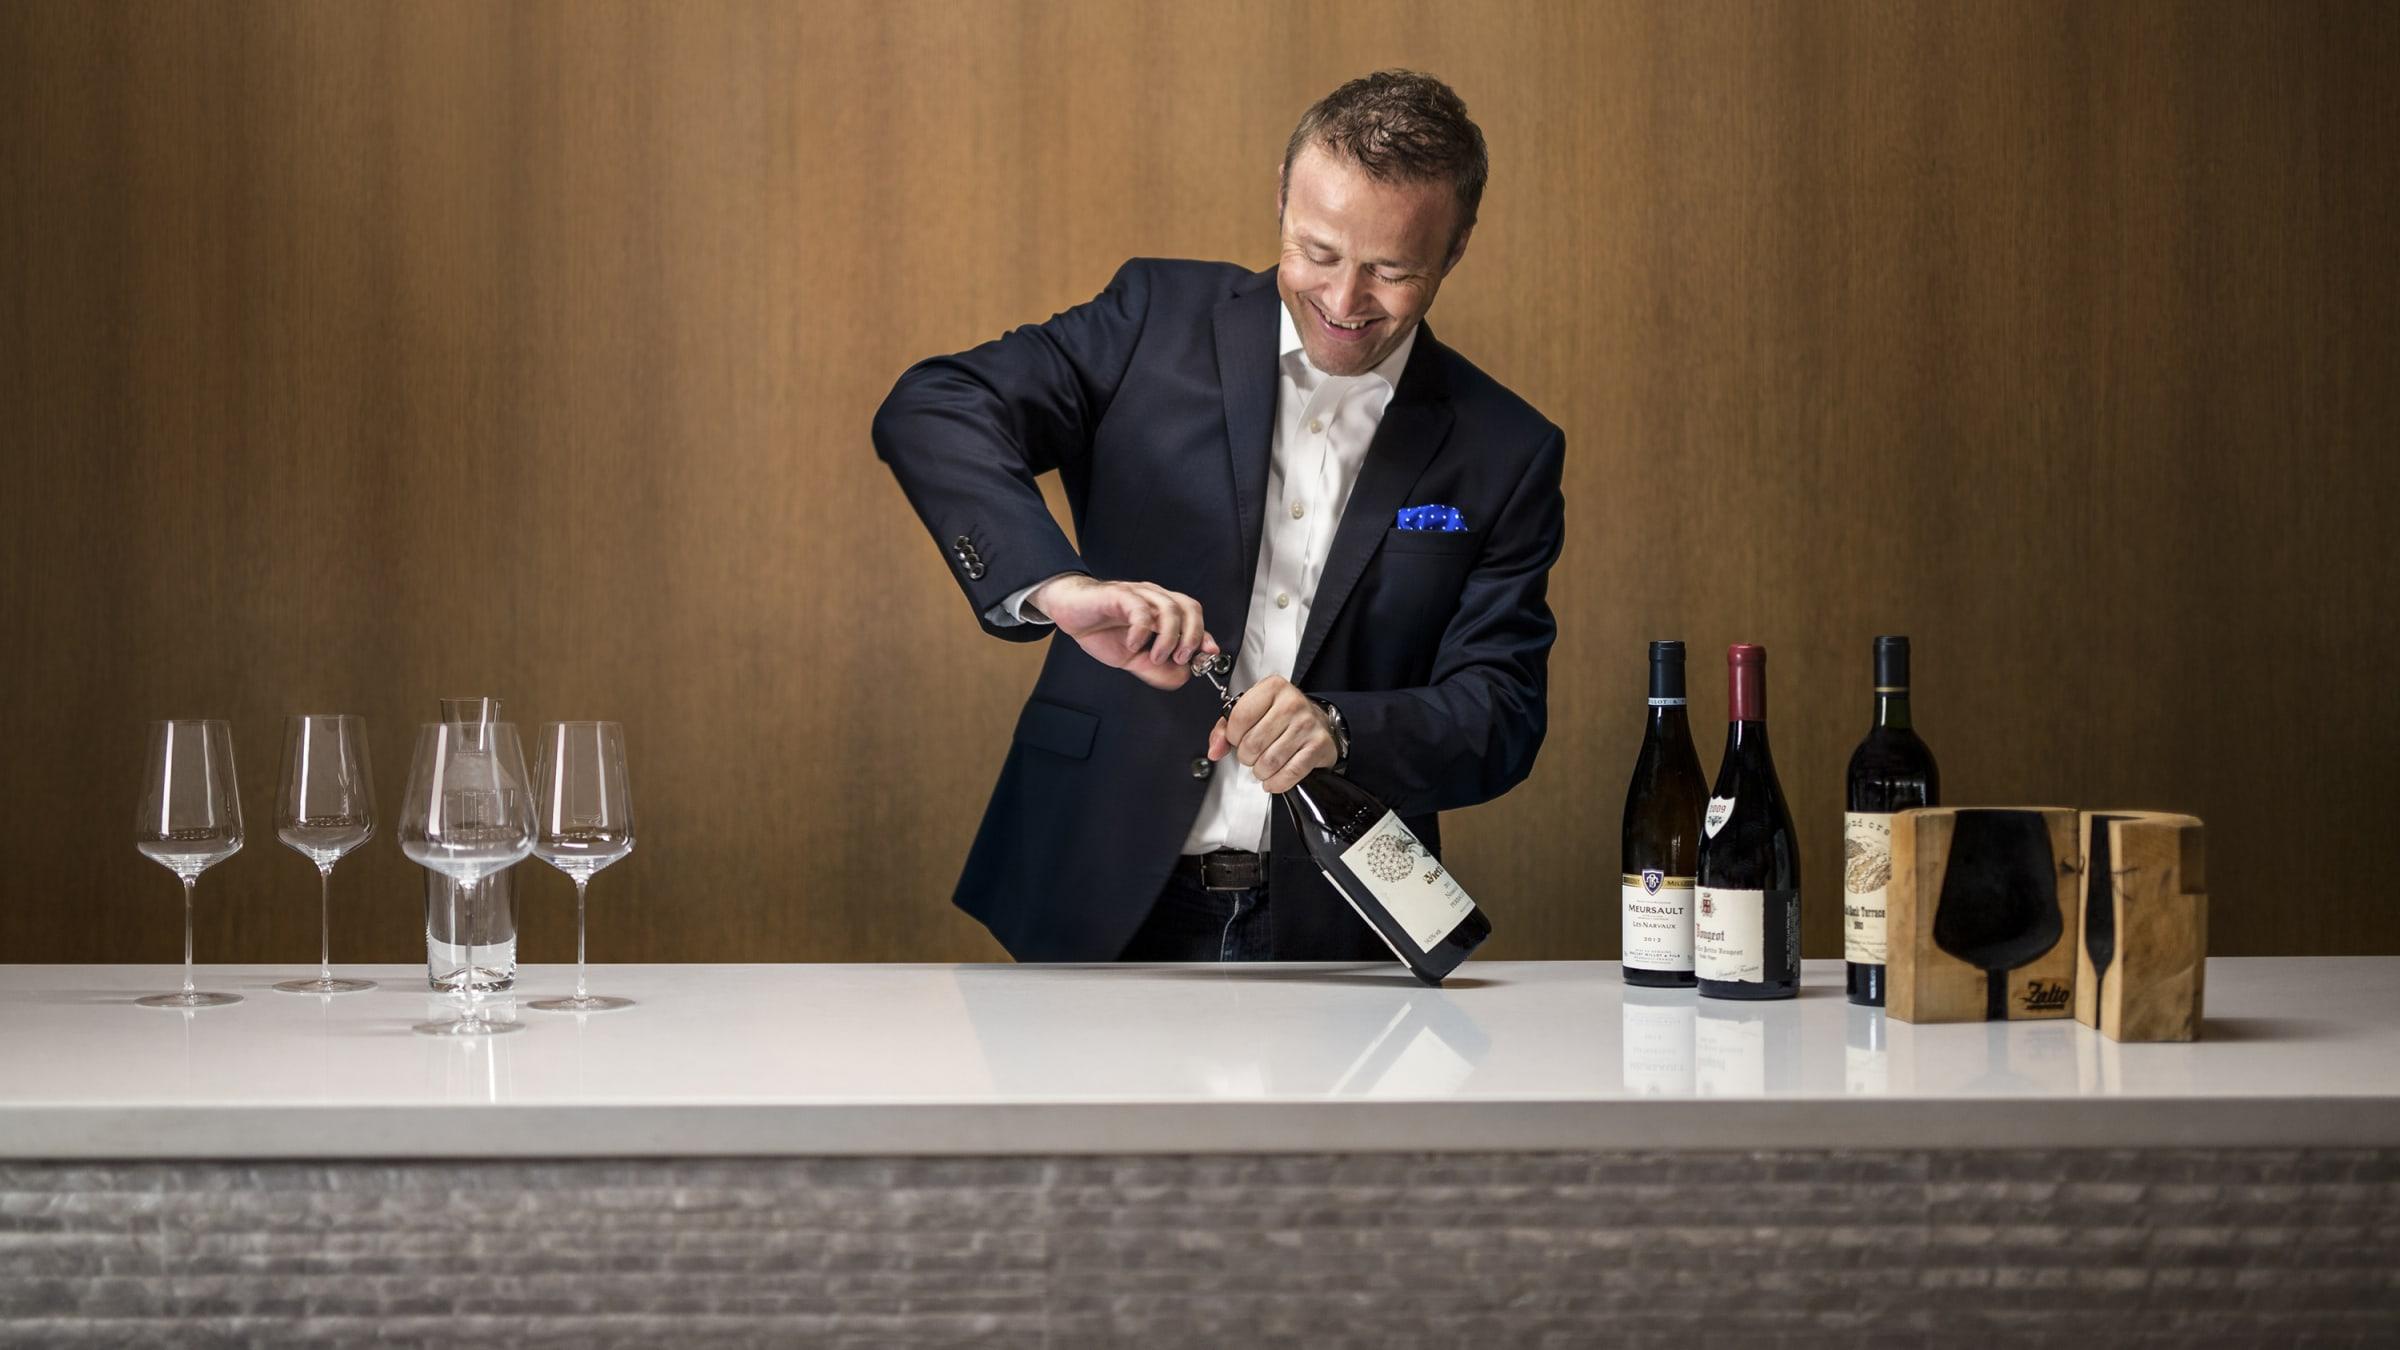 DAILY BEAST  The Secret to Le Bernardin's Award-Winning Wine Program? Female Sommeliers